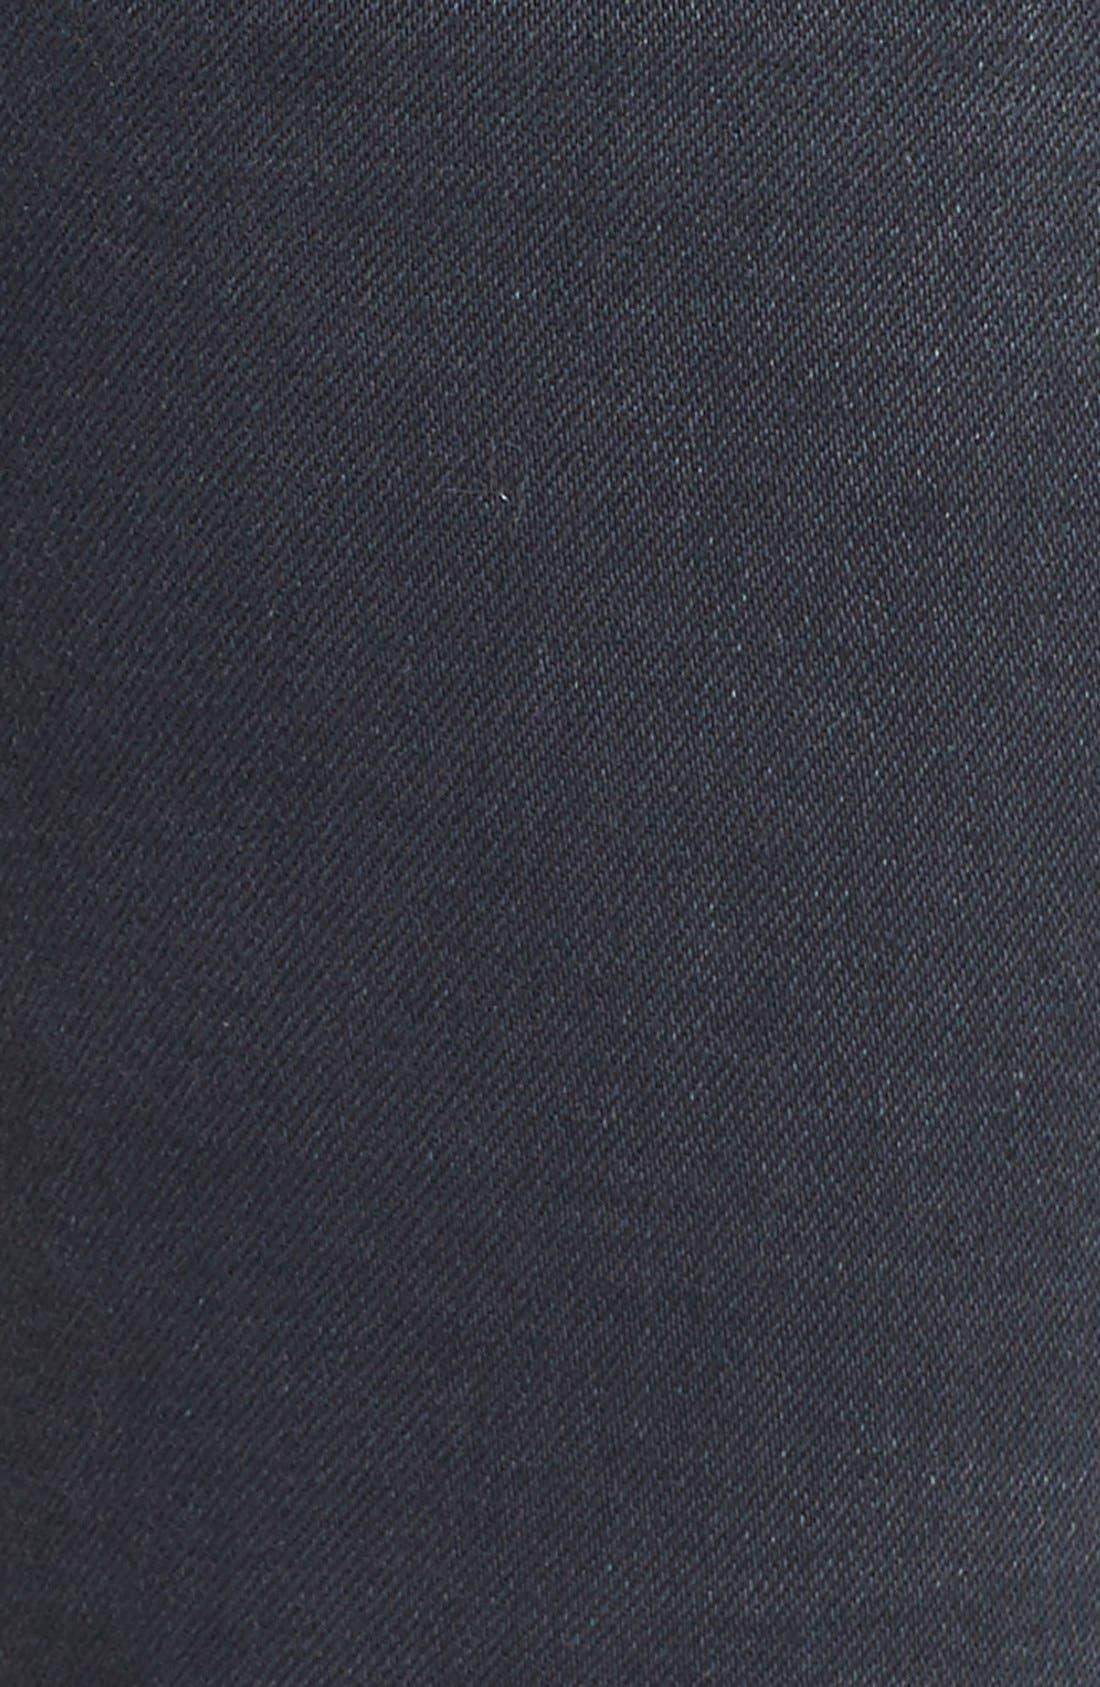 Alternate Image 5  - Hudson Jeans Krista Ankle Jeans (Stormy Horizon)